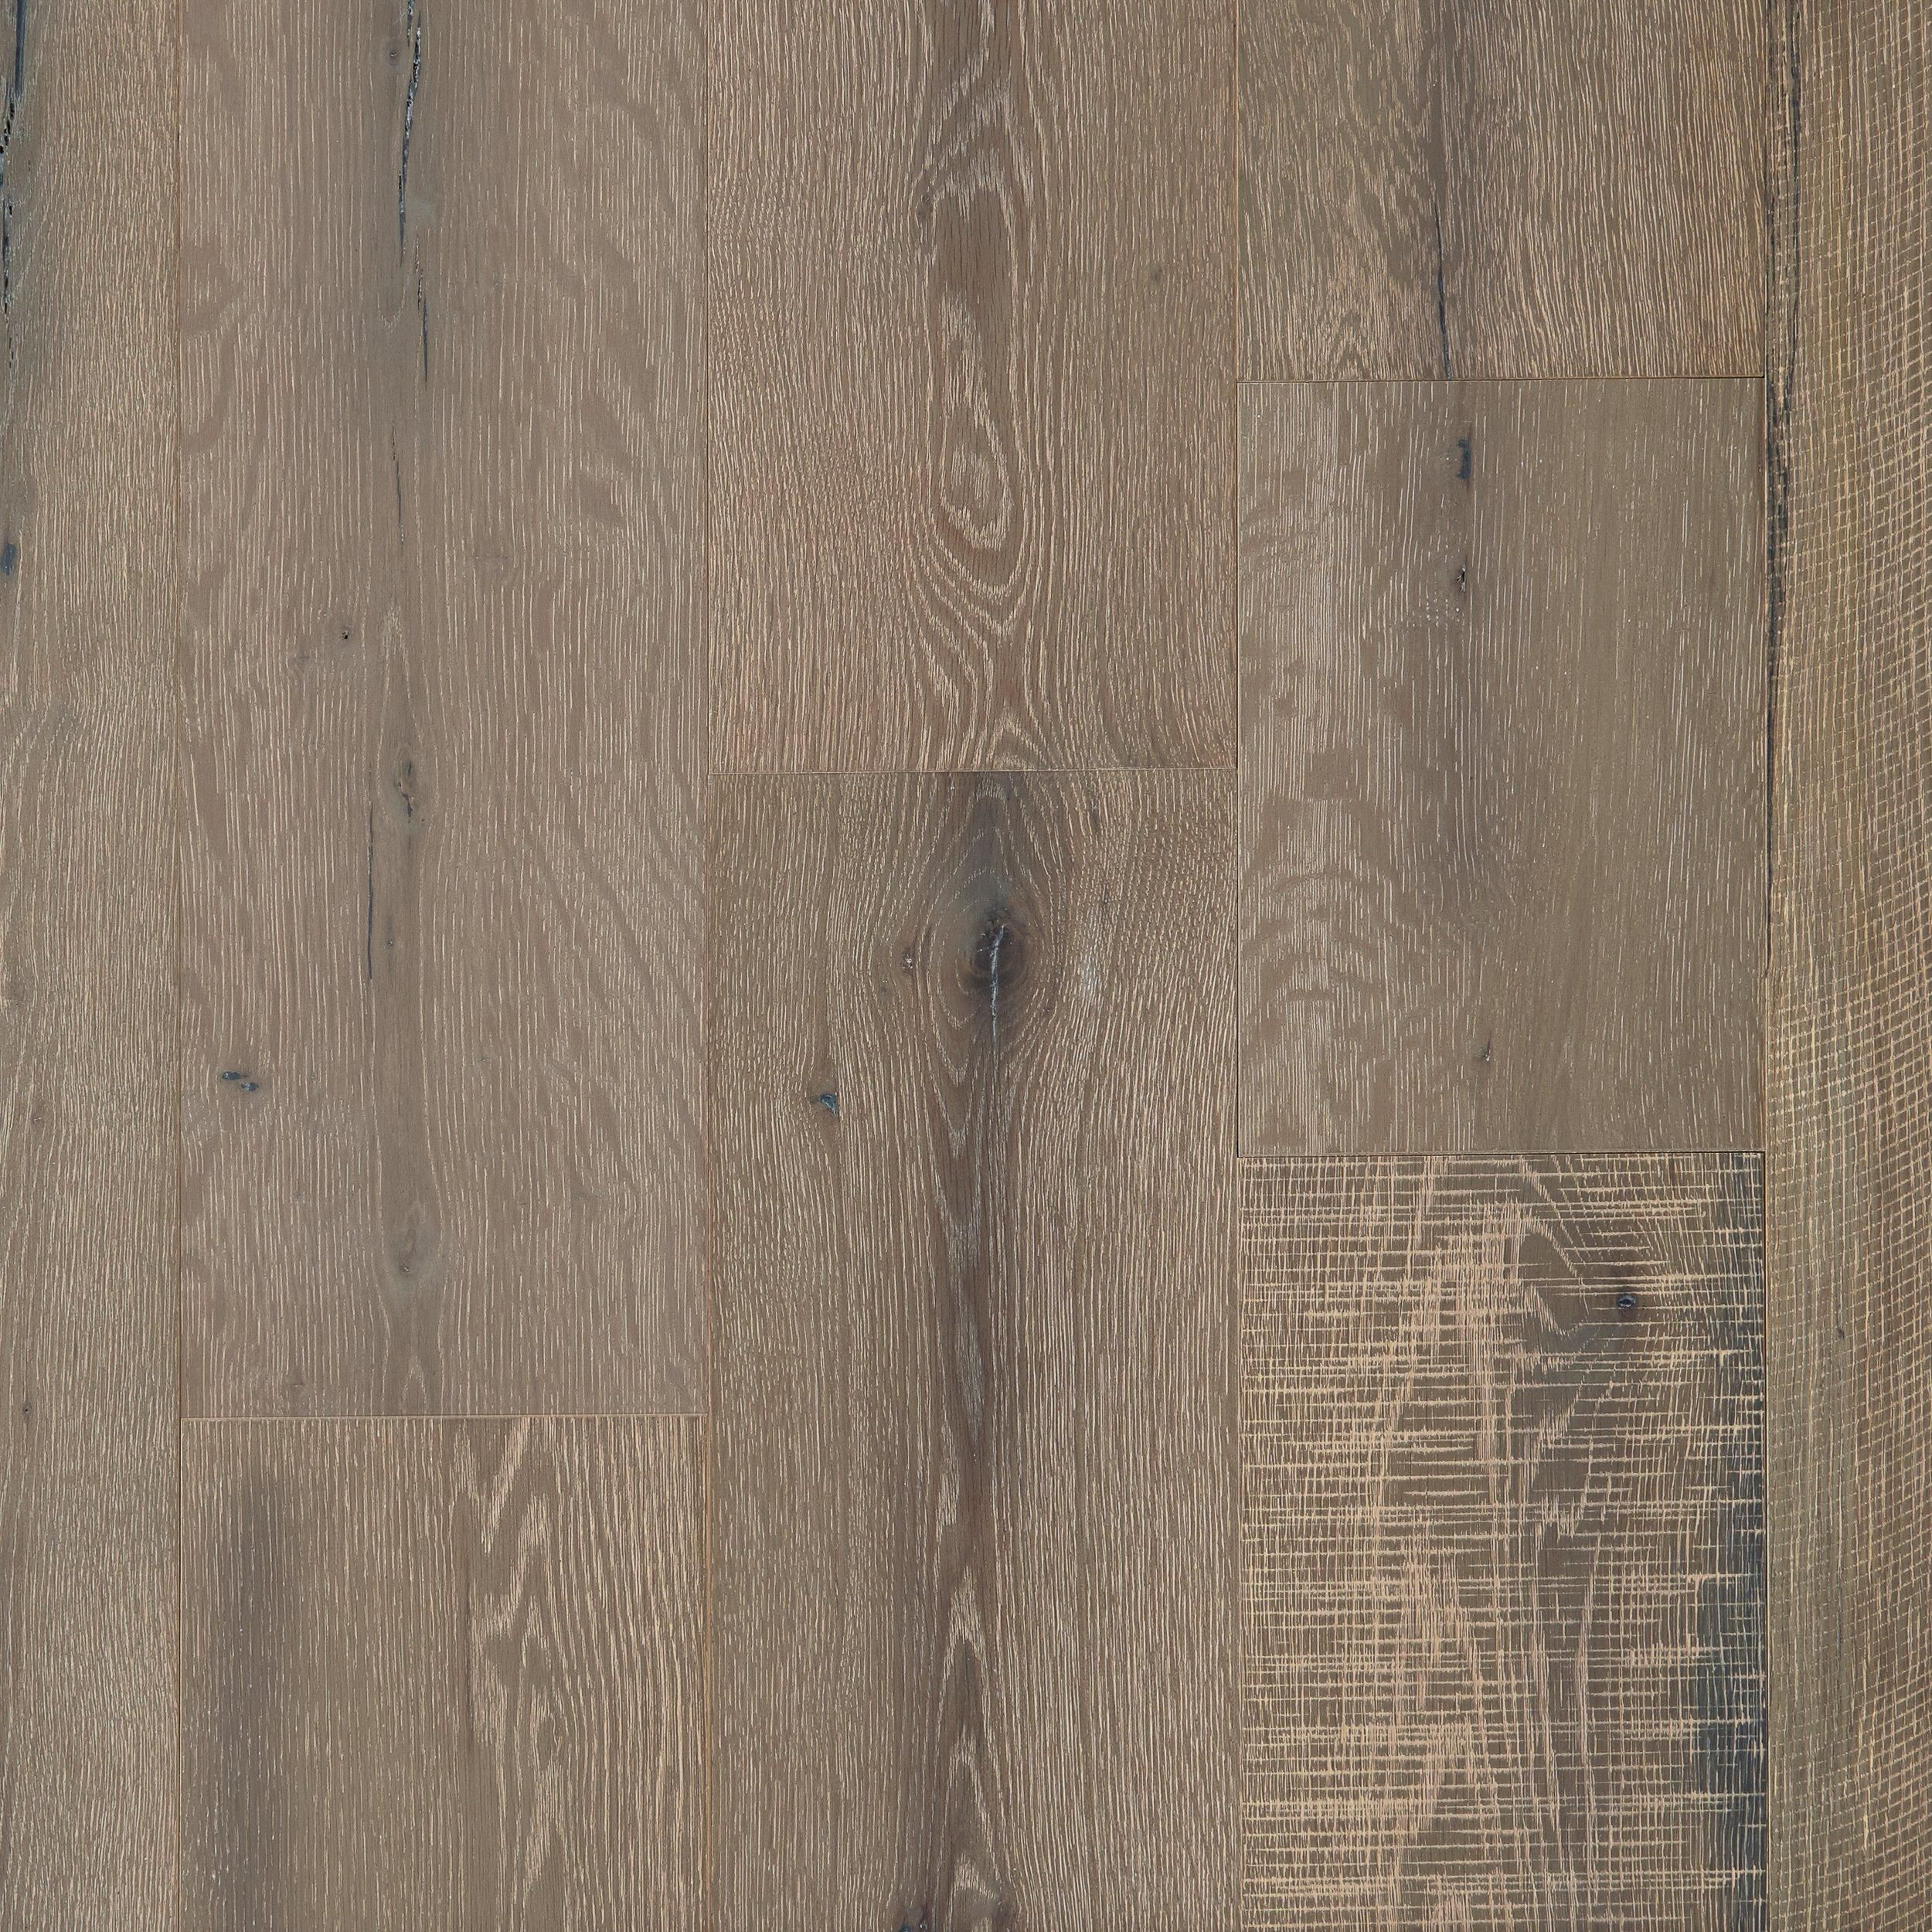 rustic white oak hardwood flooring of grullo white oak distressed engineered hardwood products for grullo white oak distressed engineered hardwood